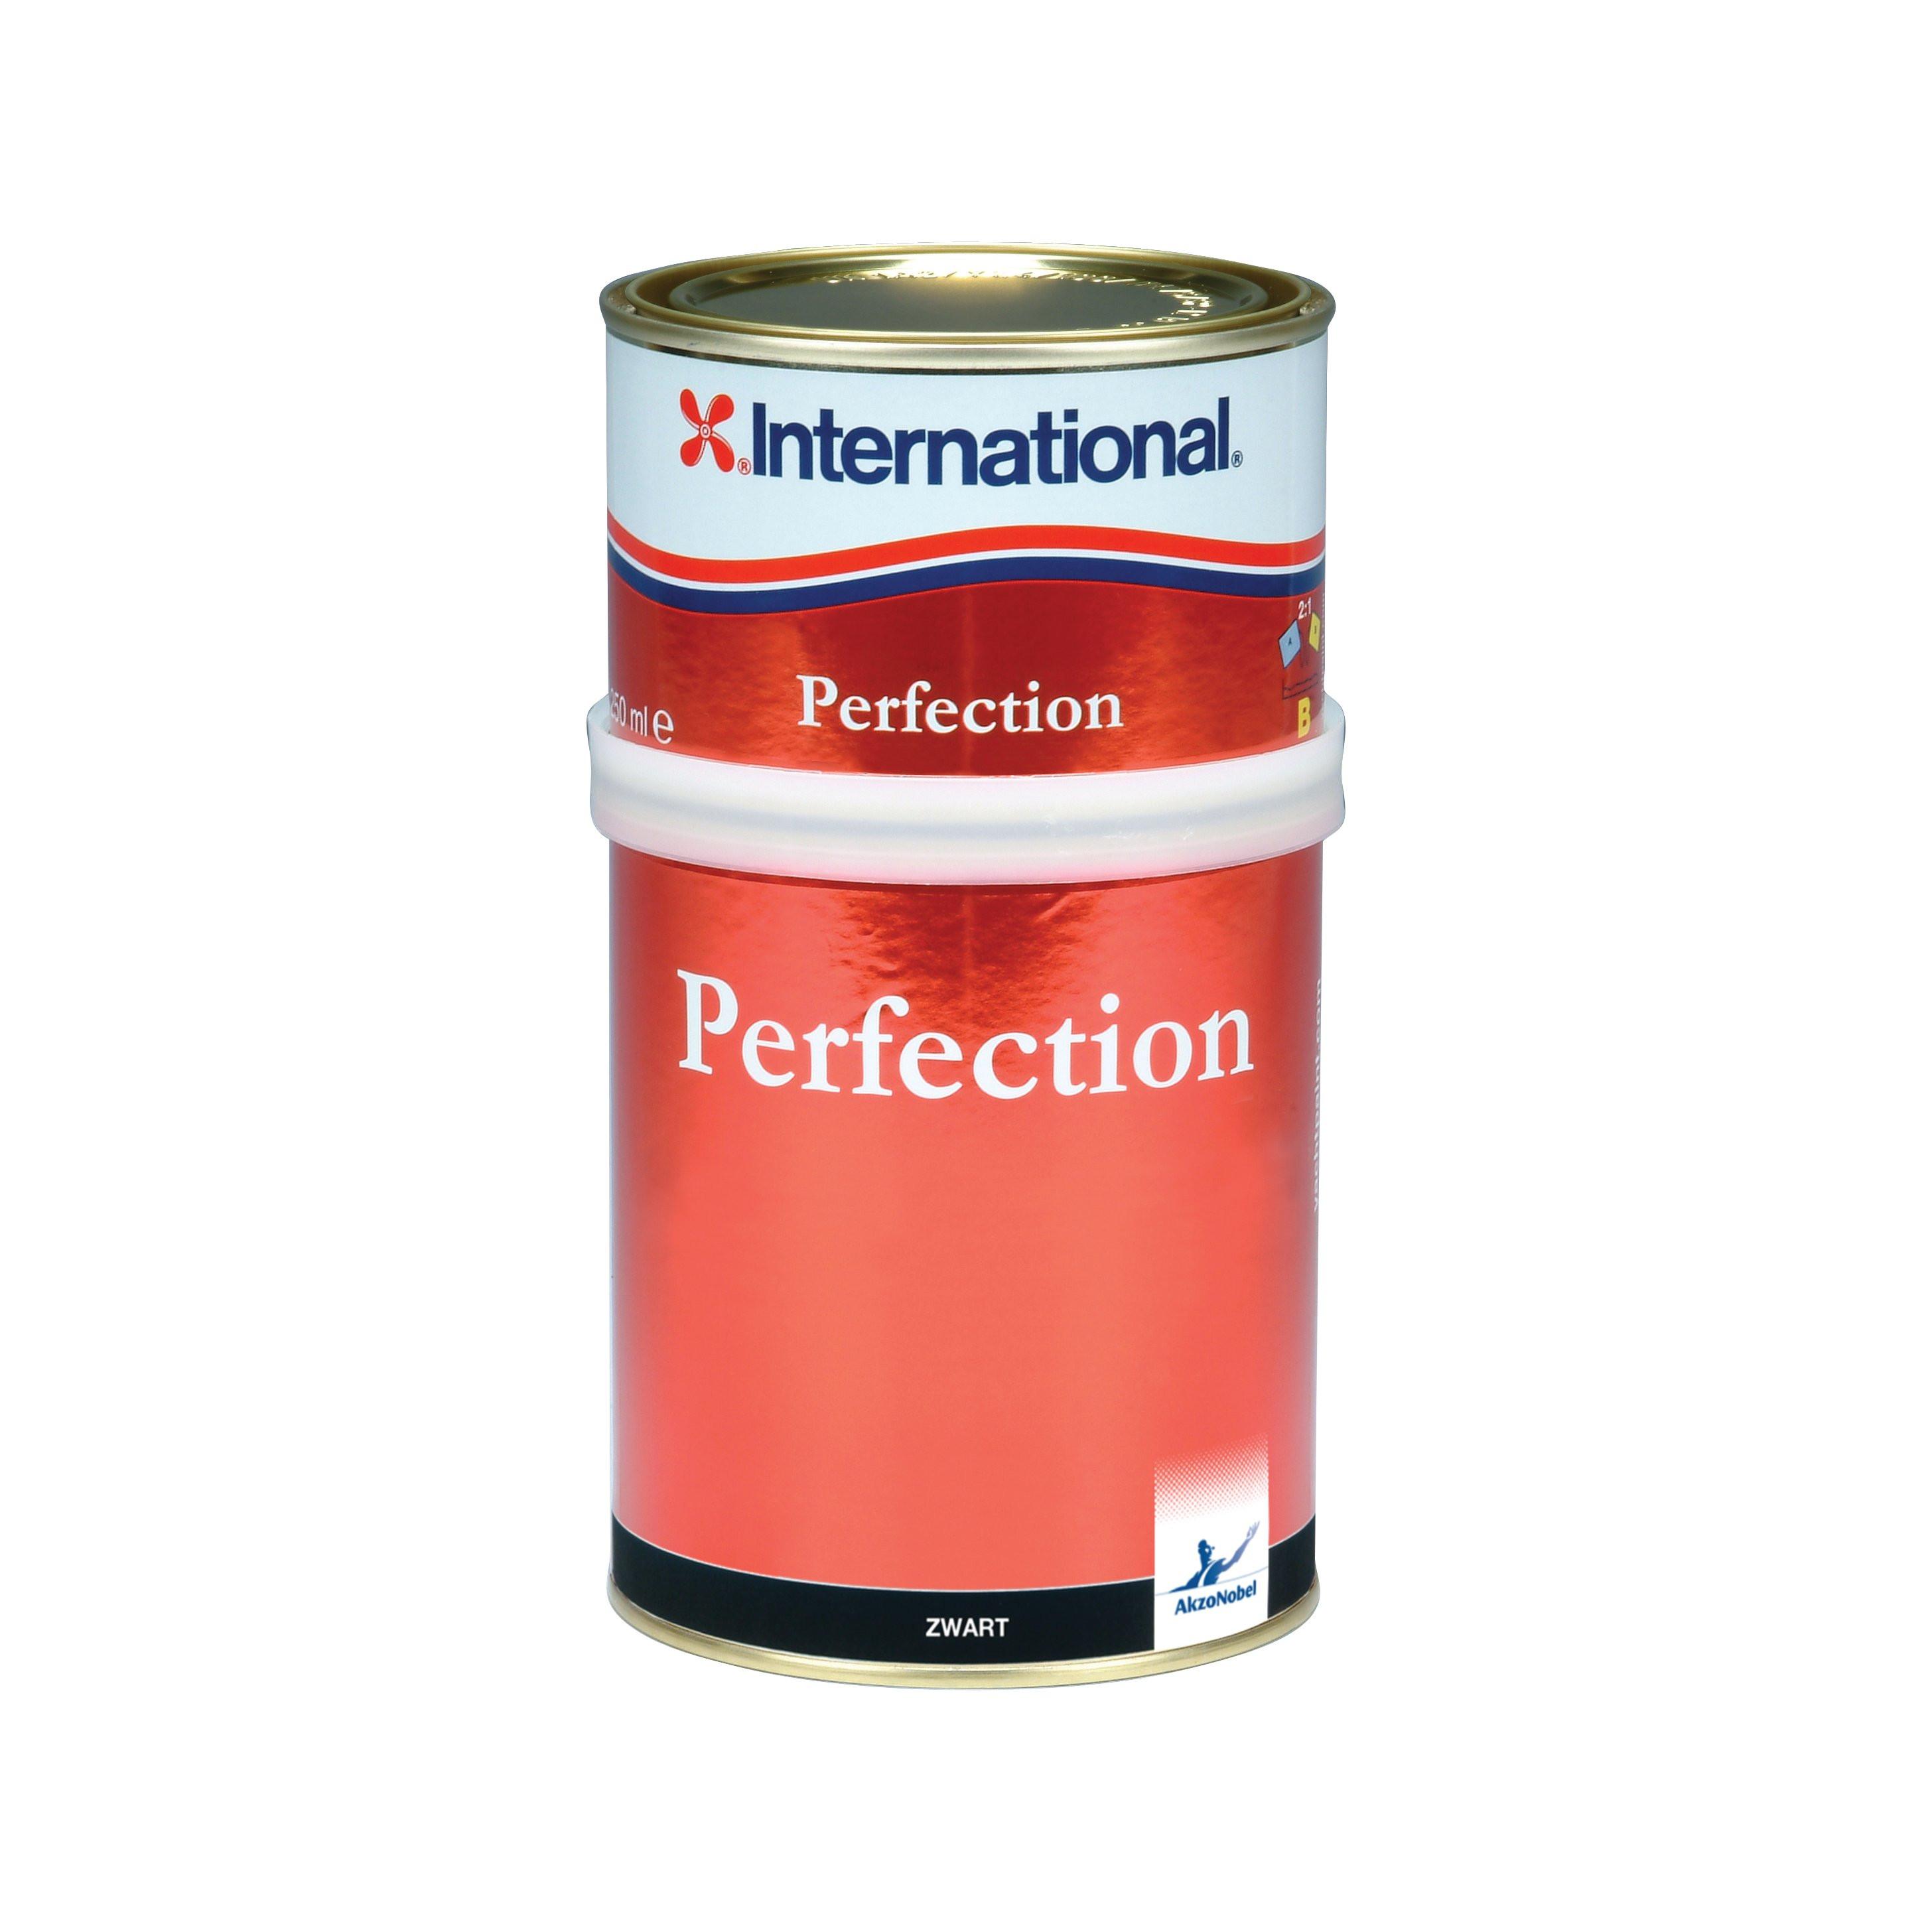 International Perfection aflak - blauw 216, 750ml